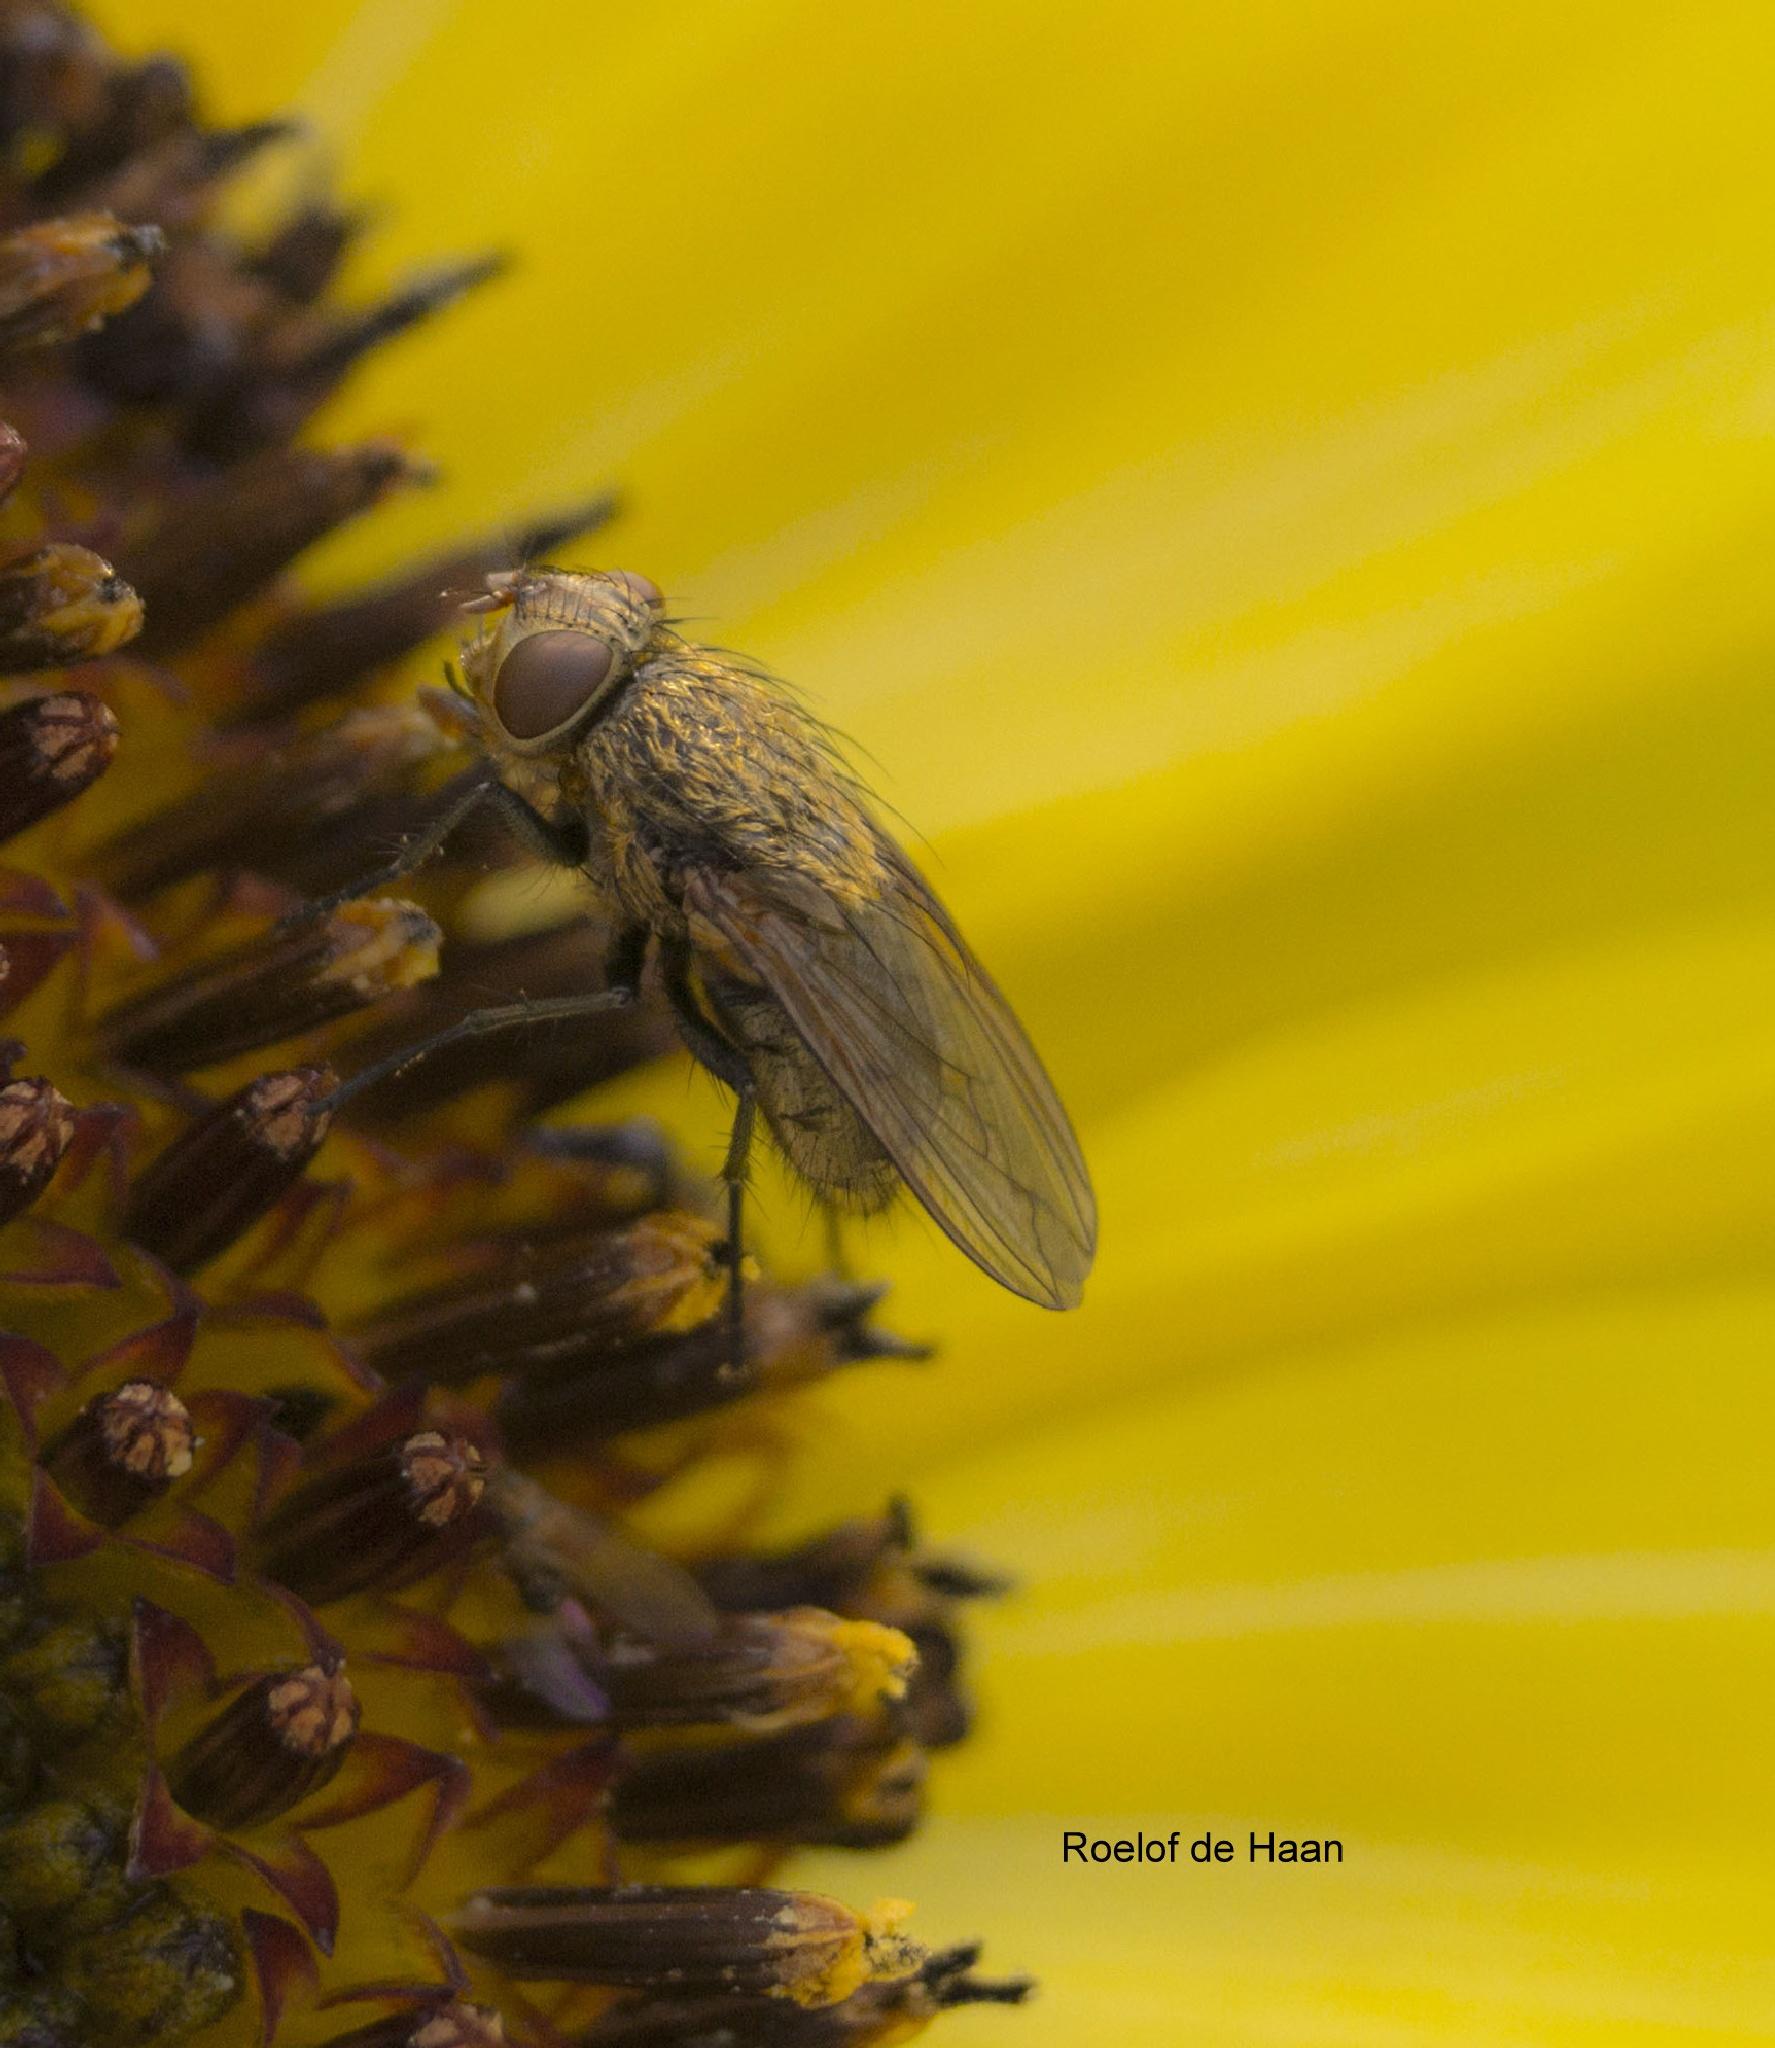 Fly sitting on sunflower by Roelof de Haan